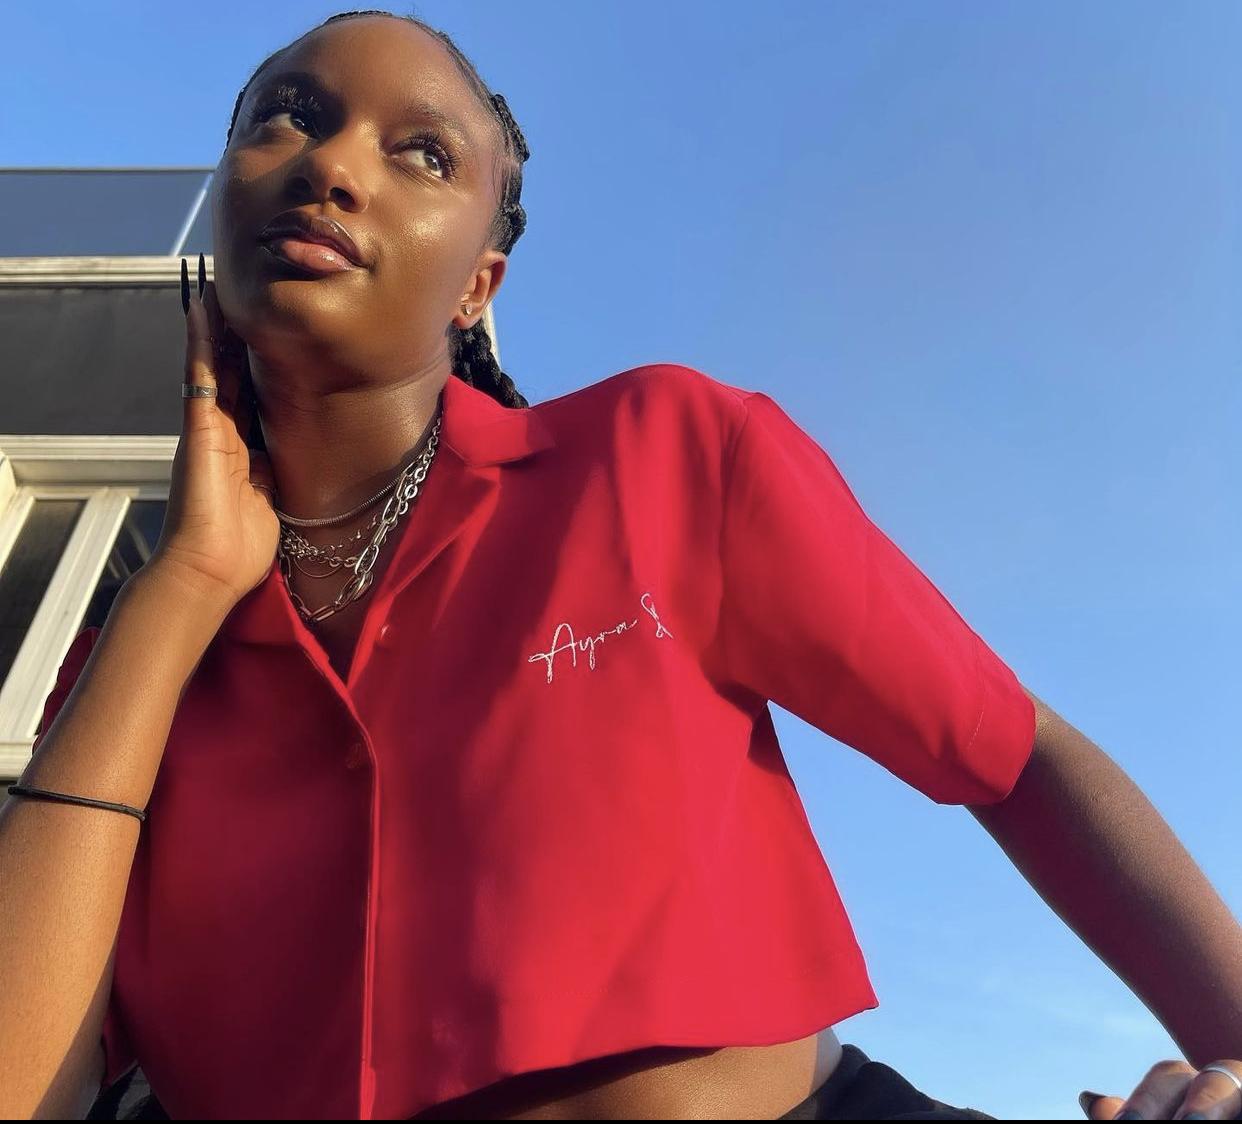 MAVIN Records Act Ayra Starr Set To Drop Debut Album